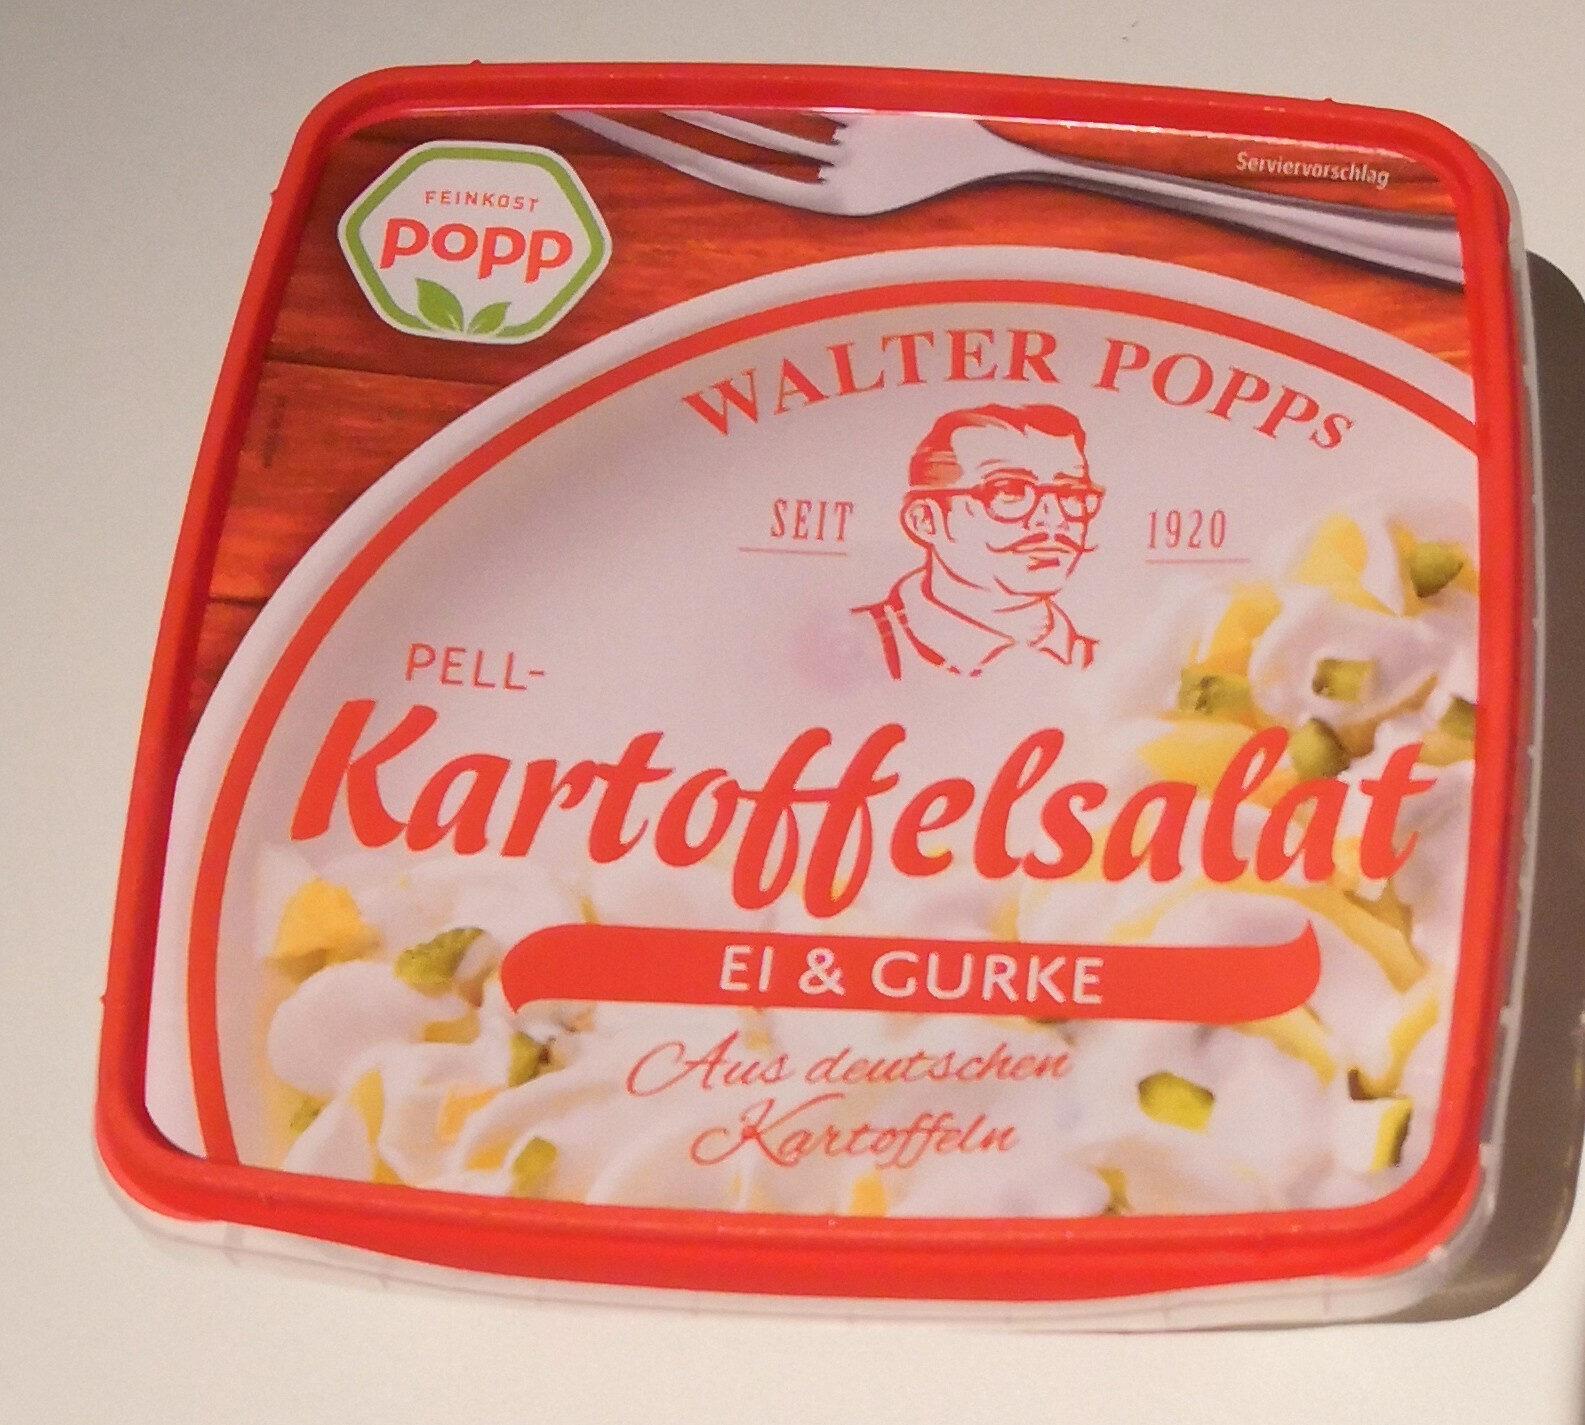 PELL Kartoffelsalat - Product - de